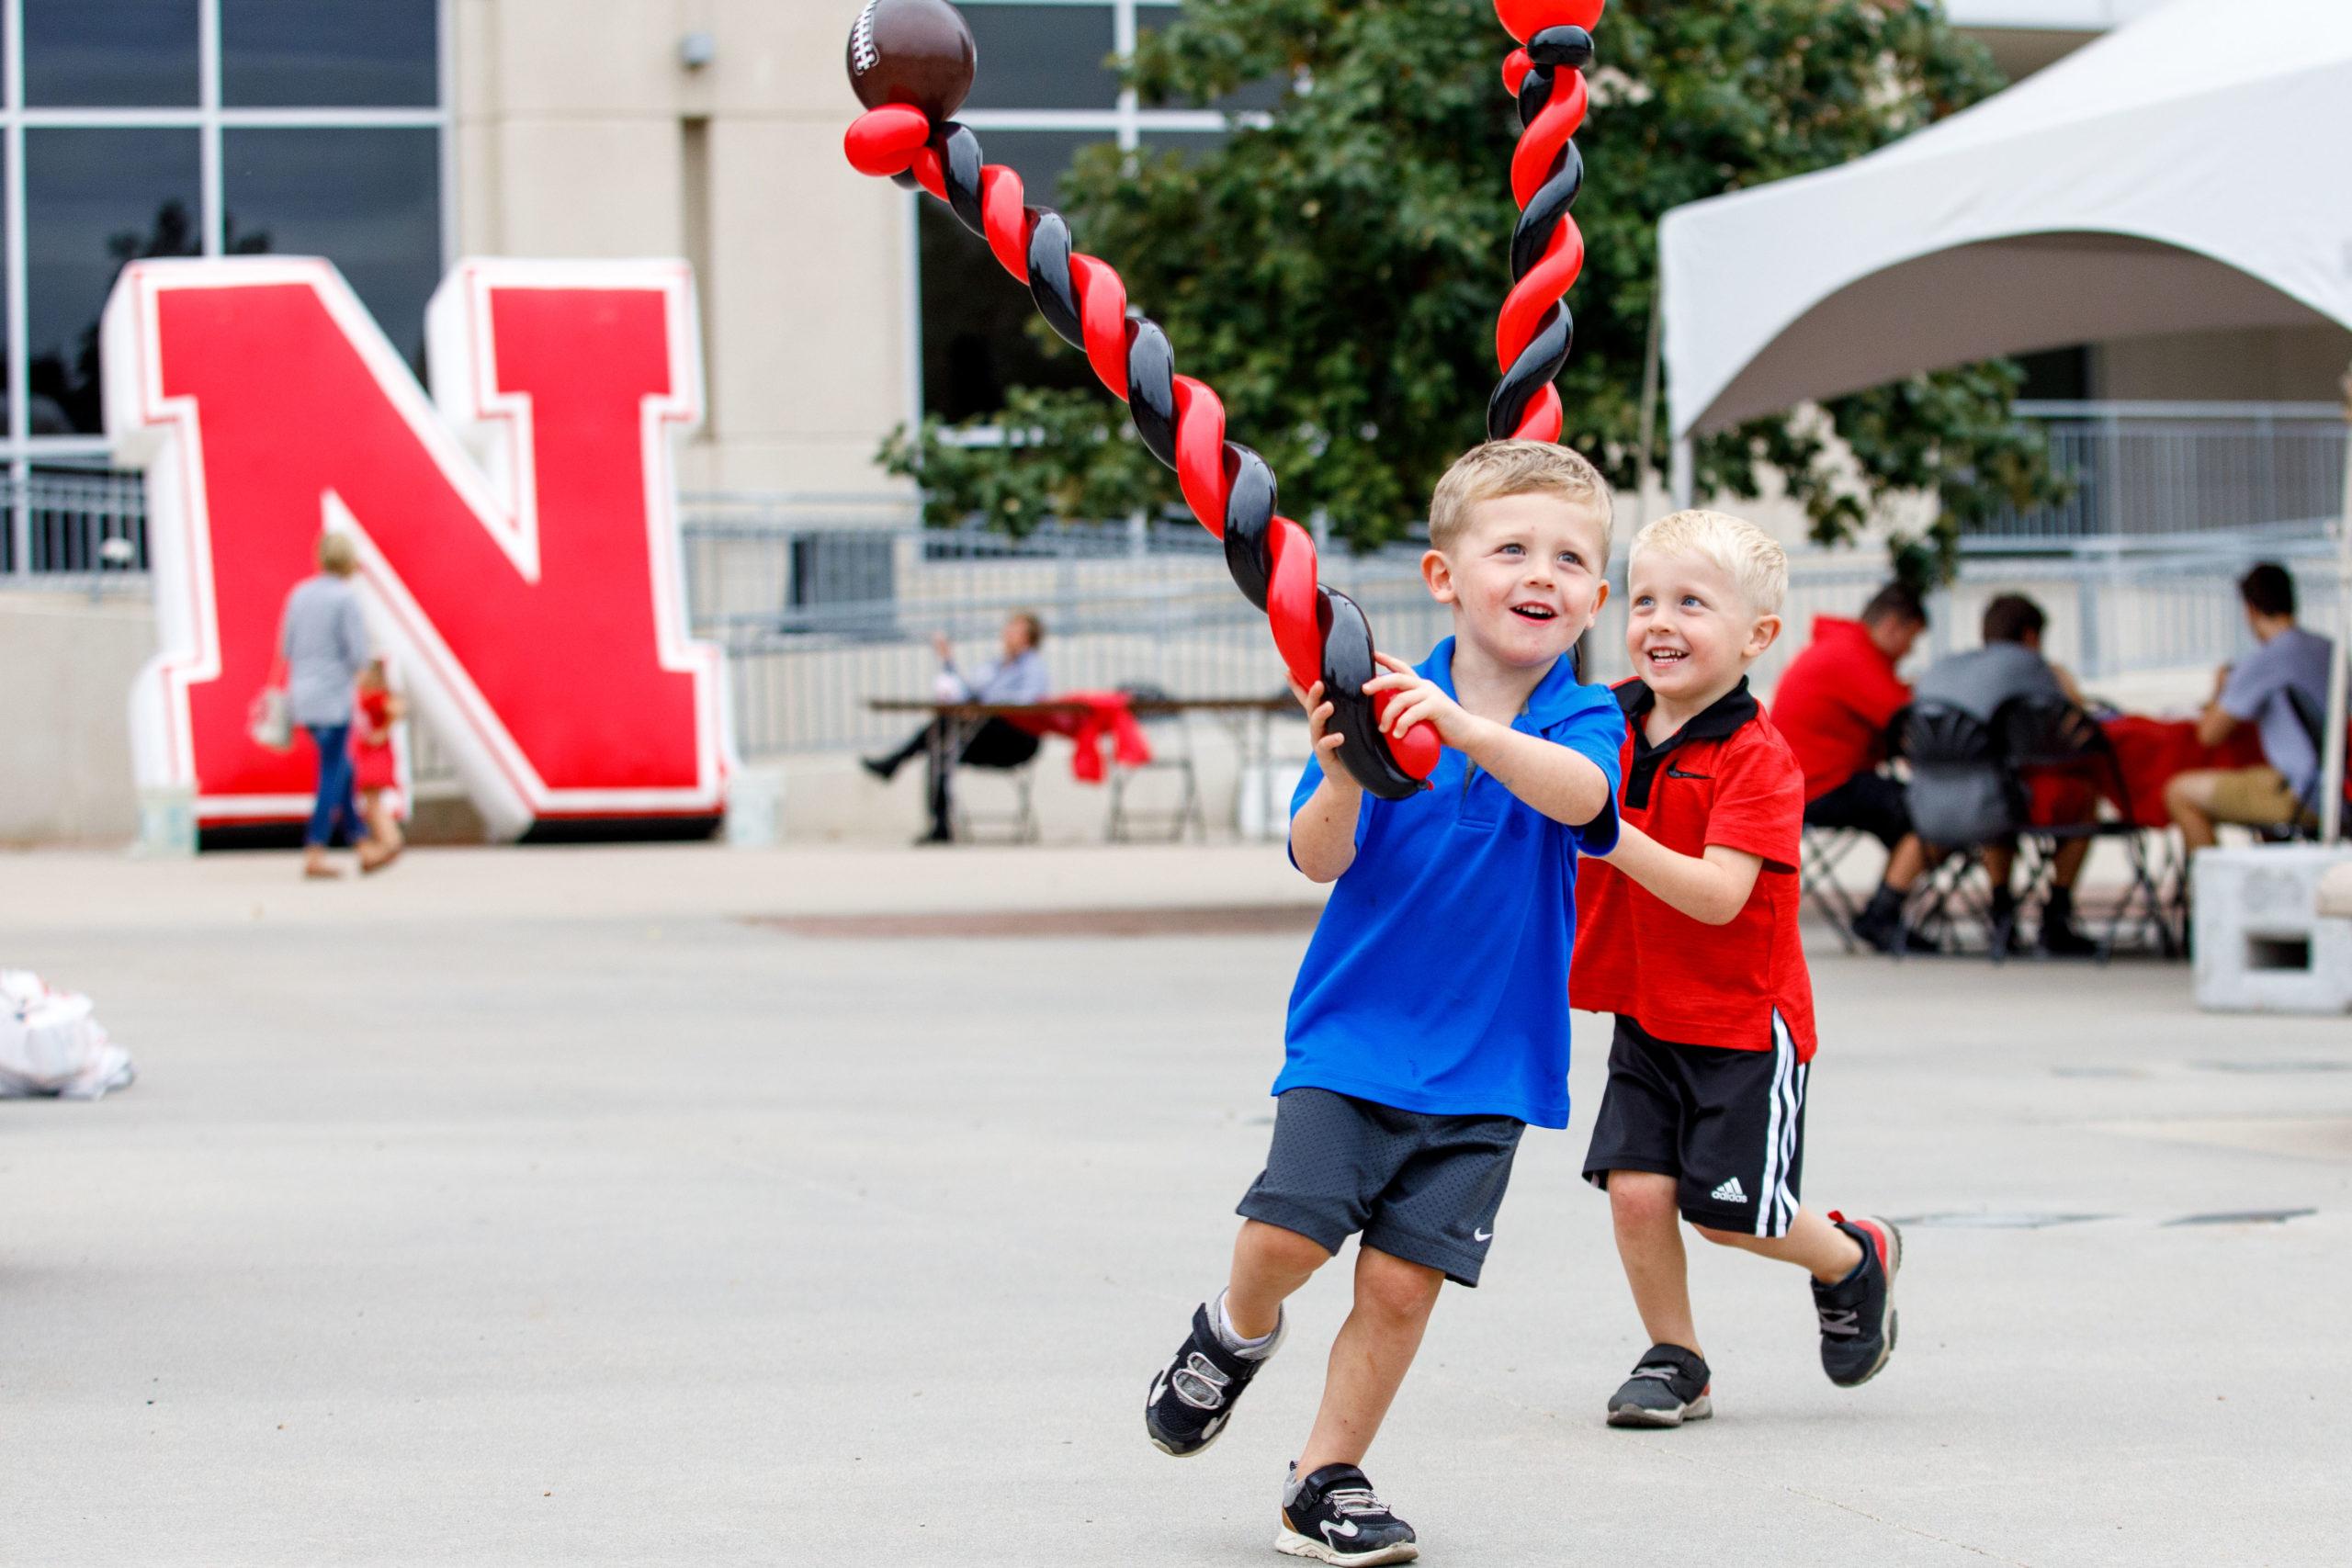 10022022 Homecoming02 3 scaled - University of Nebraska-Lincoln Homecoming weekend